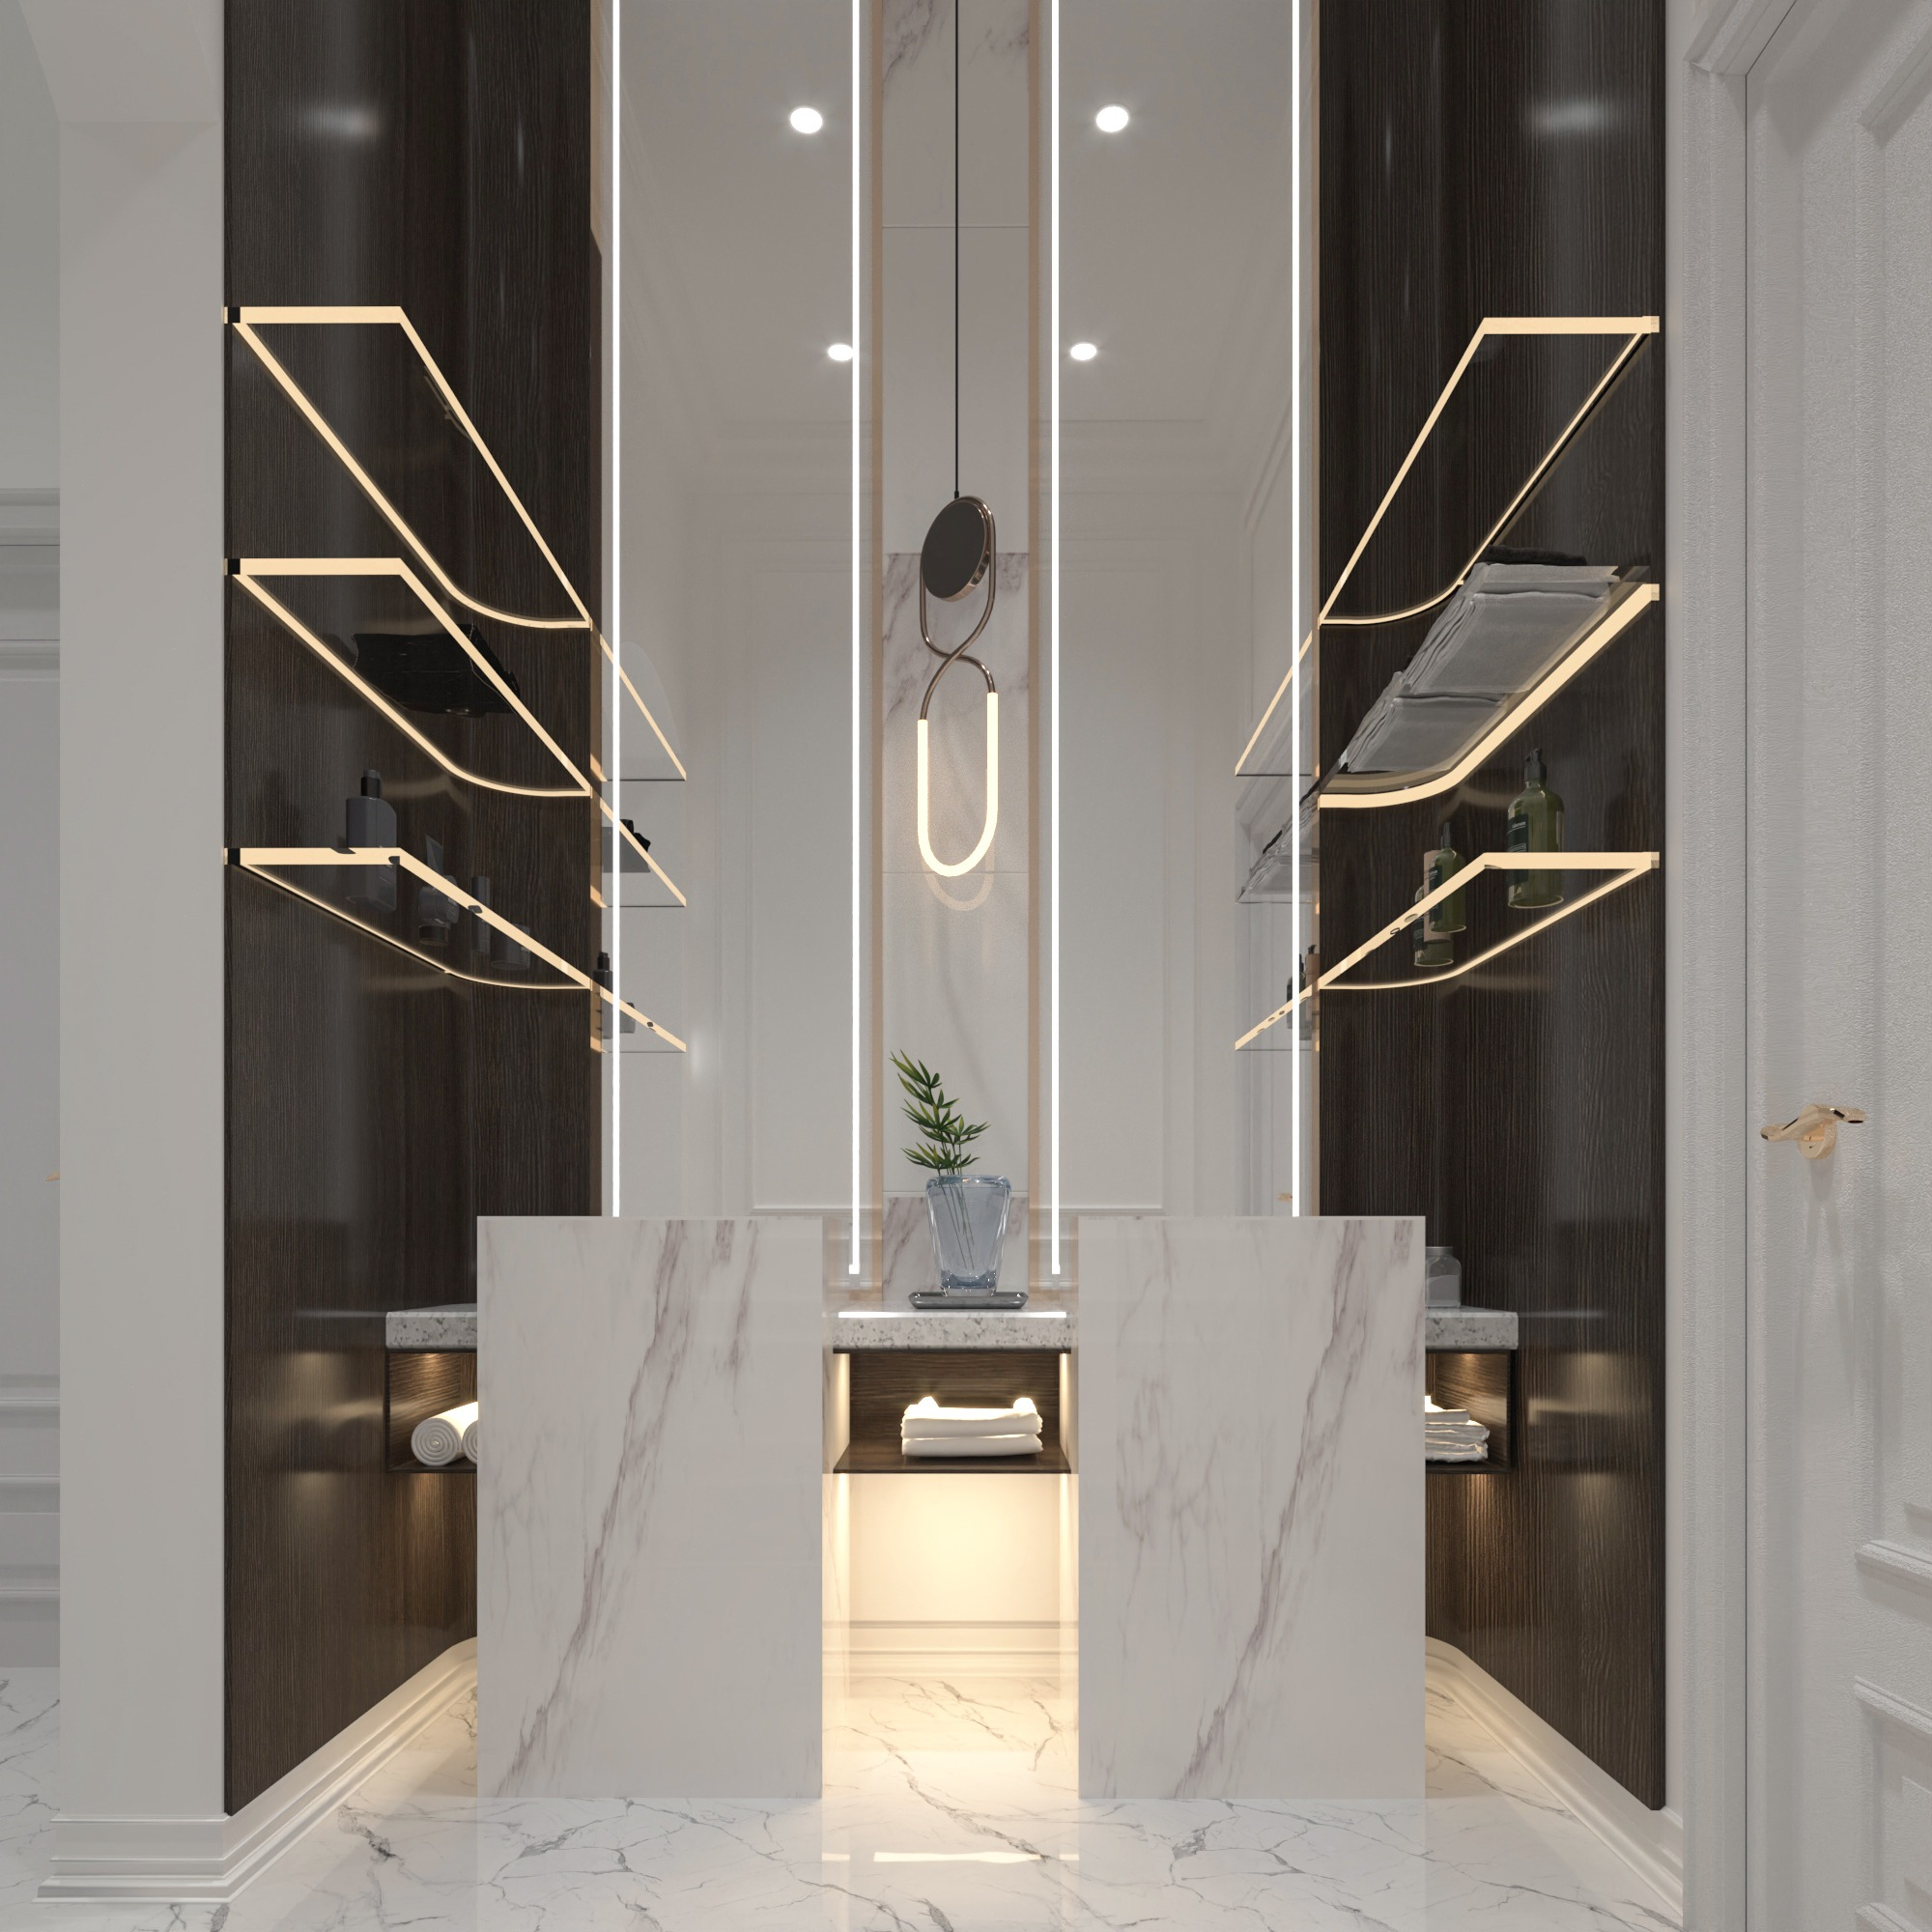 GLASS DESIGN - LIGHT WORK - MARBLE SINK